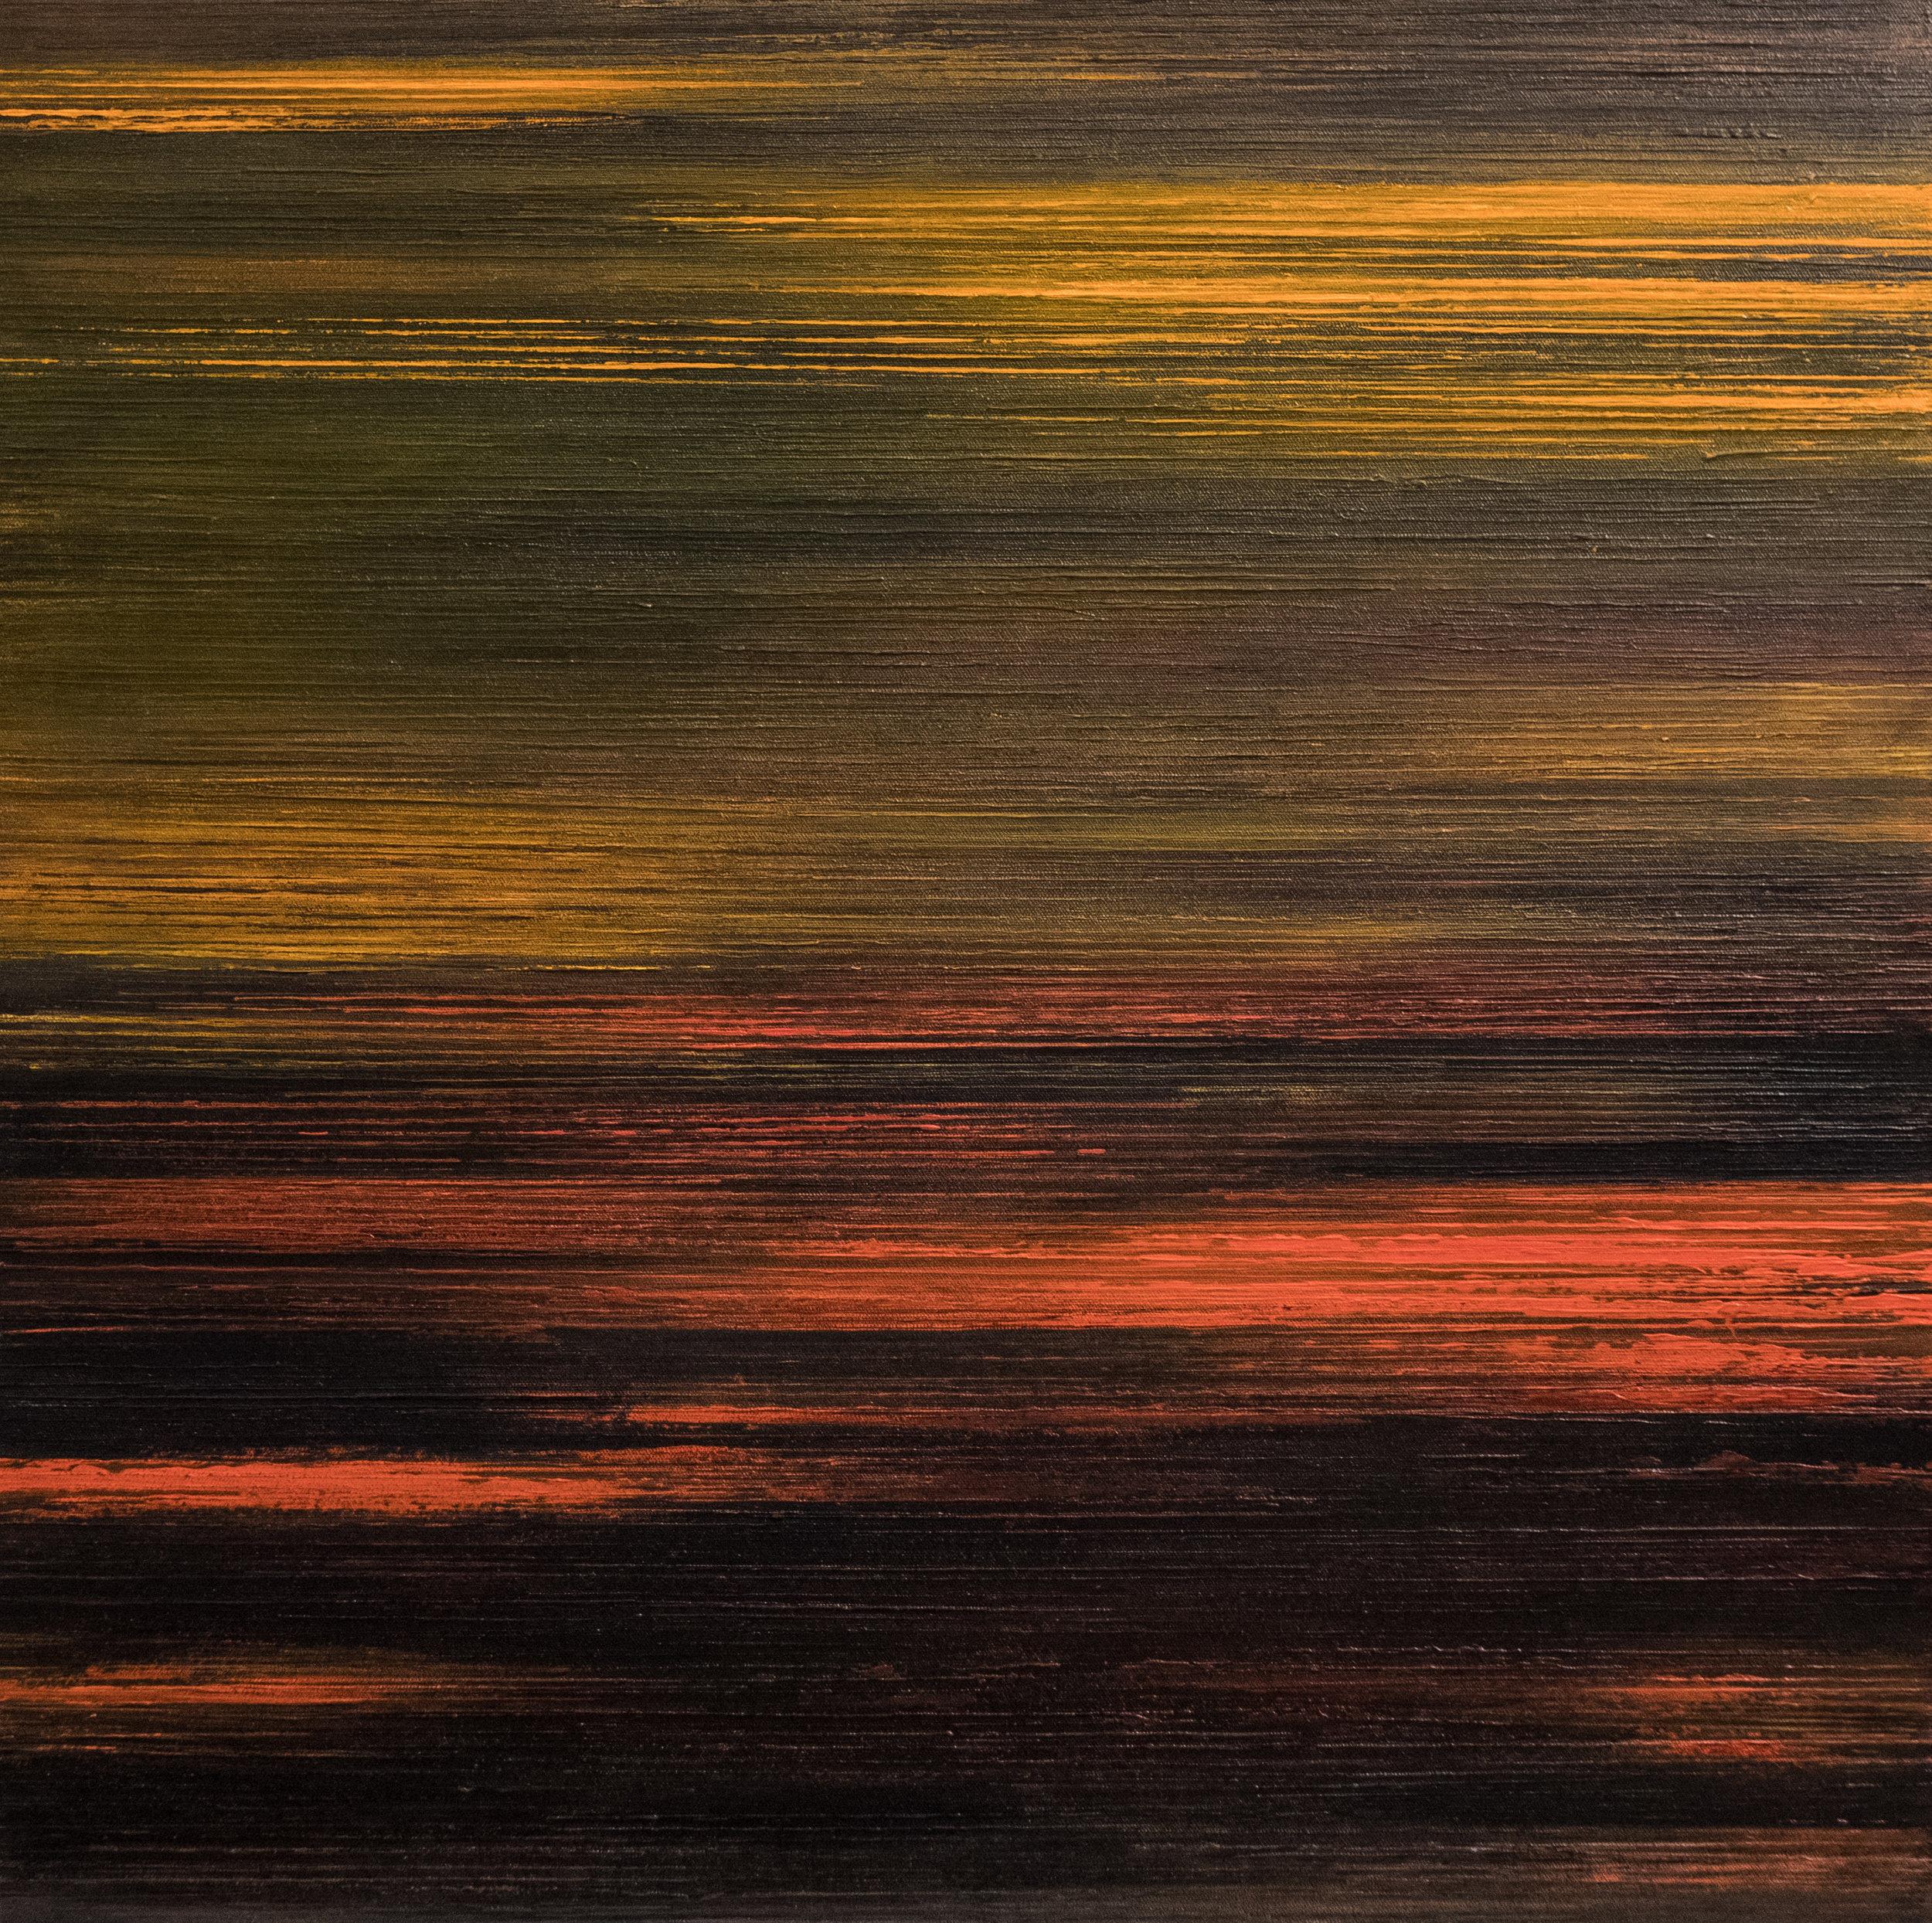 Linescape V - Orange/Brown/Yellow 2016